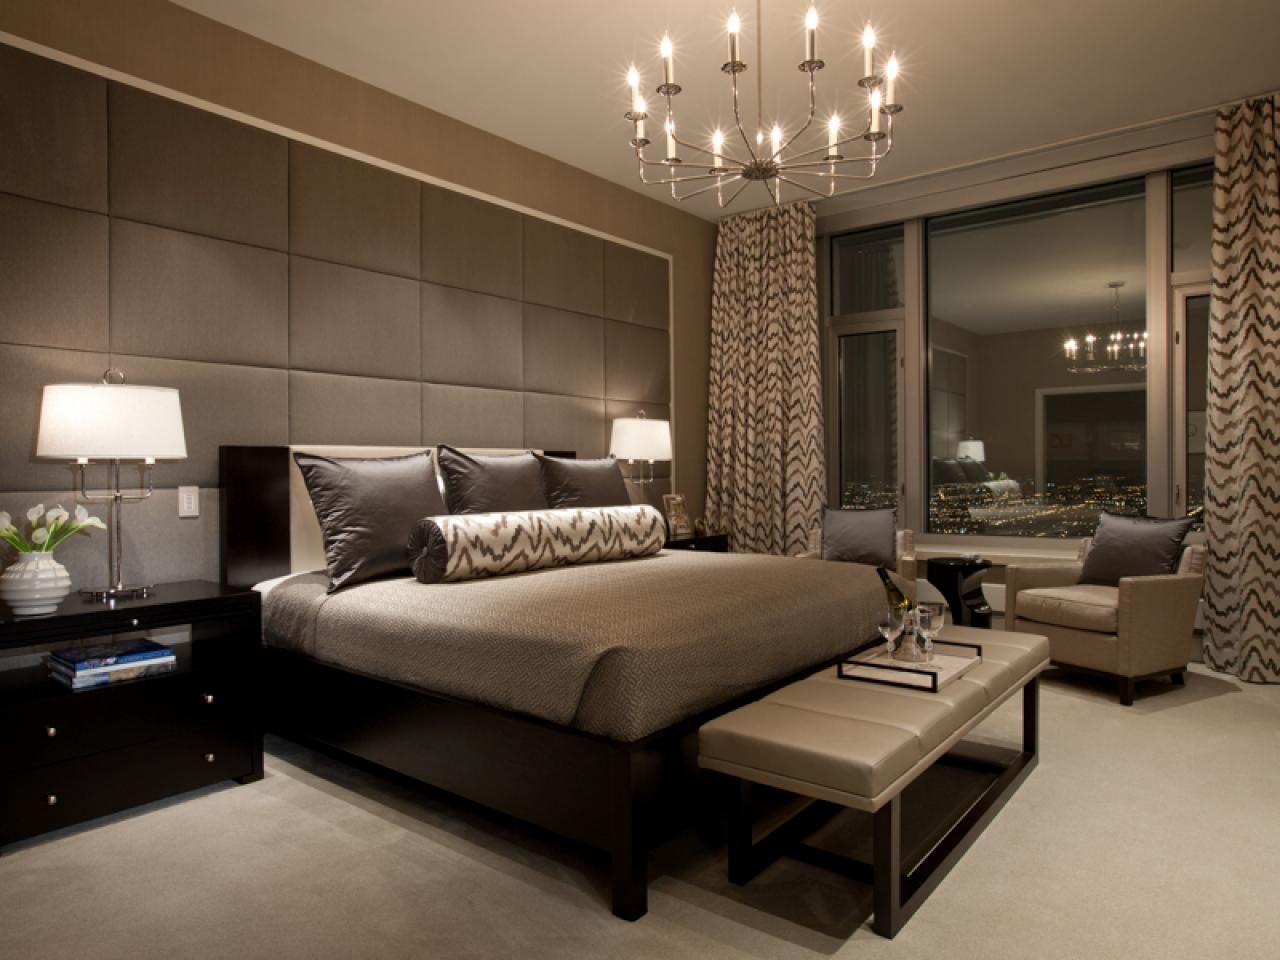 Sanctuaries With Style Luxury Bedroom Master Hotel Style Bedroom Luxury Master Bedroom Design